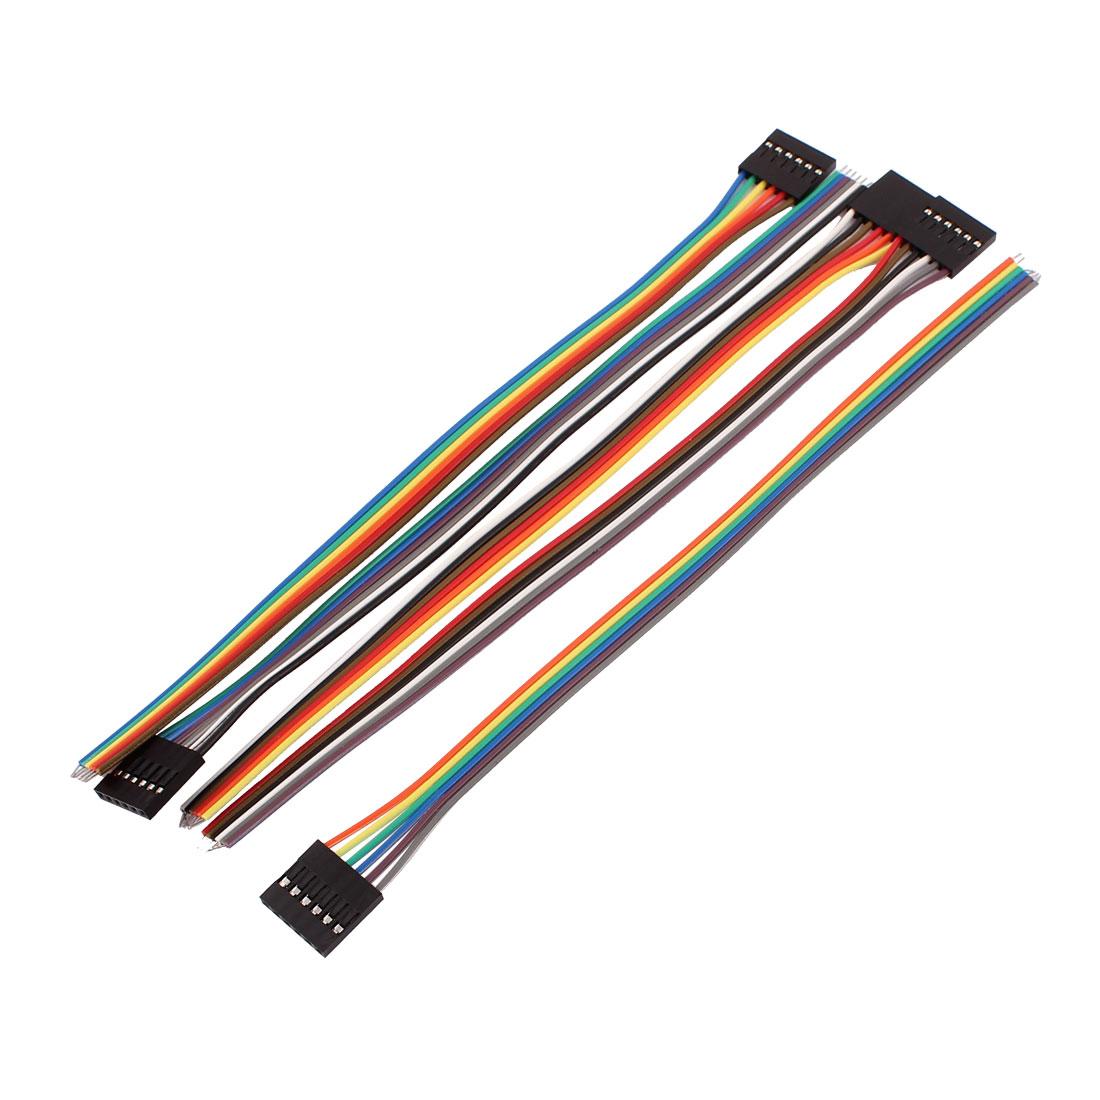 5 Pcs 6P Jumper Wires Female Ribbon Cables Pi Pic Breadboard DIY 20cm Long